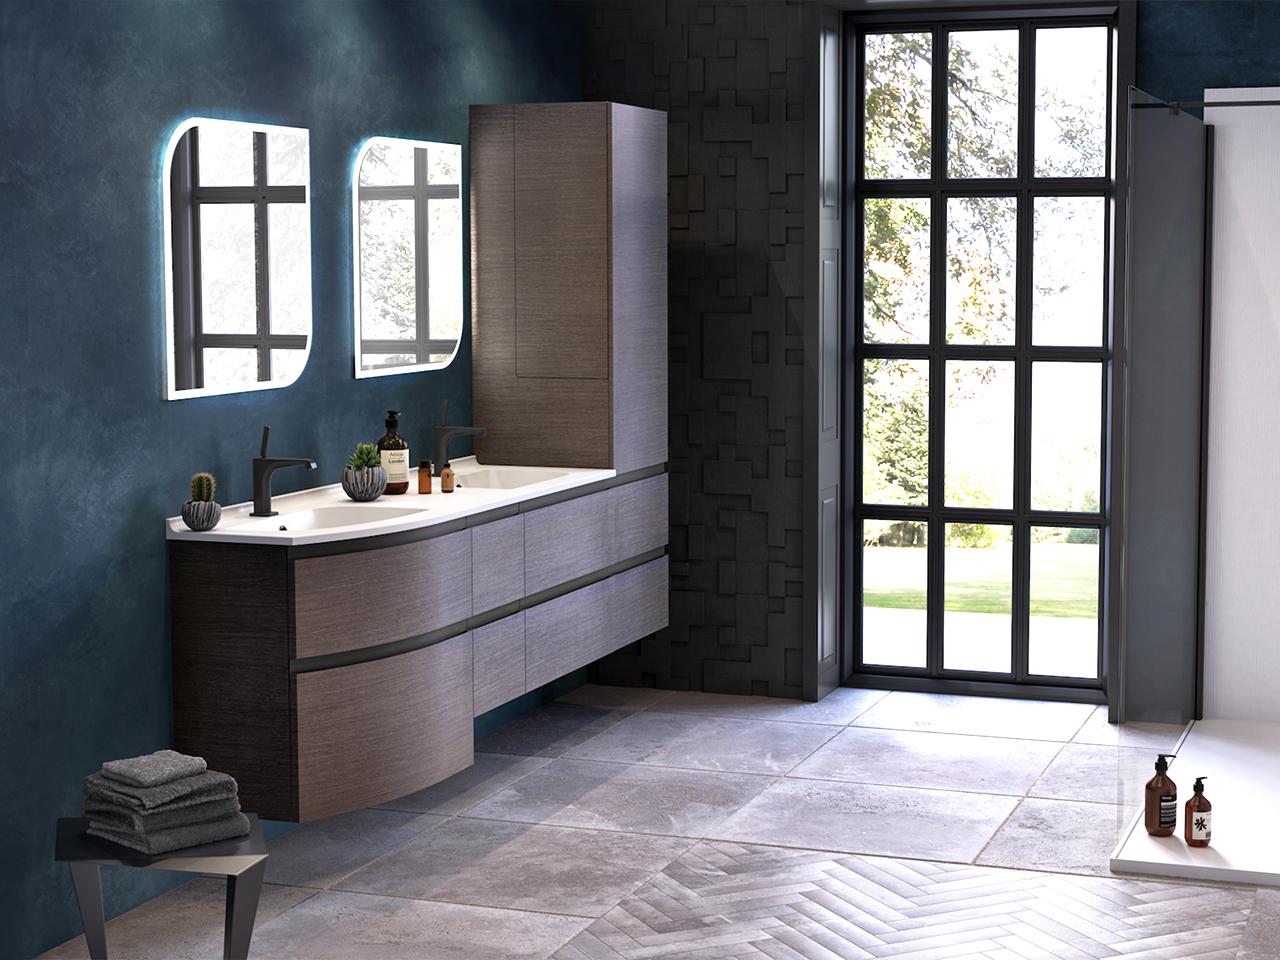 Aviso ambiance bain c b lefebvre design agile - Fabricant meuble de salle de bain ...